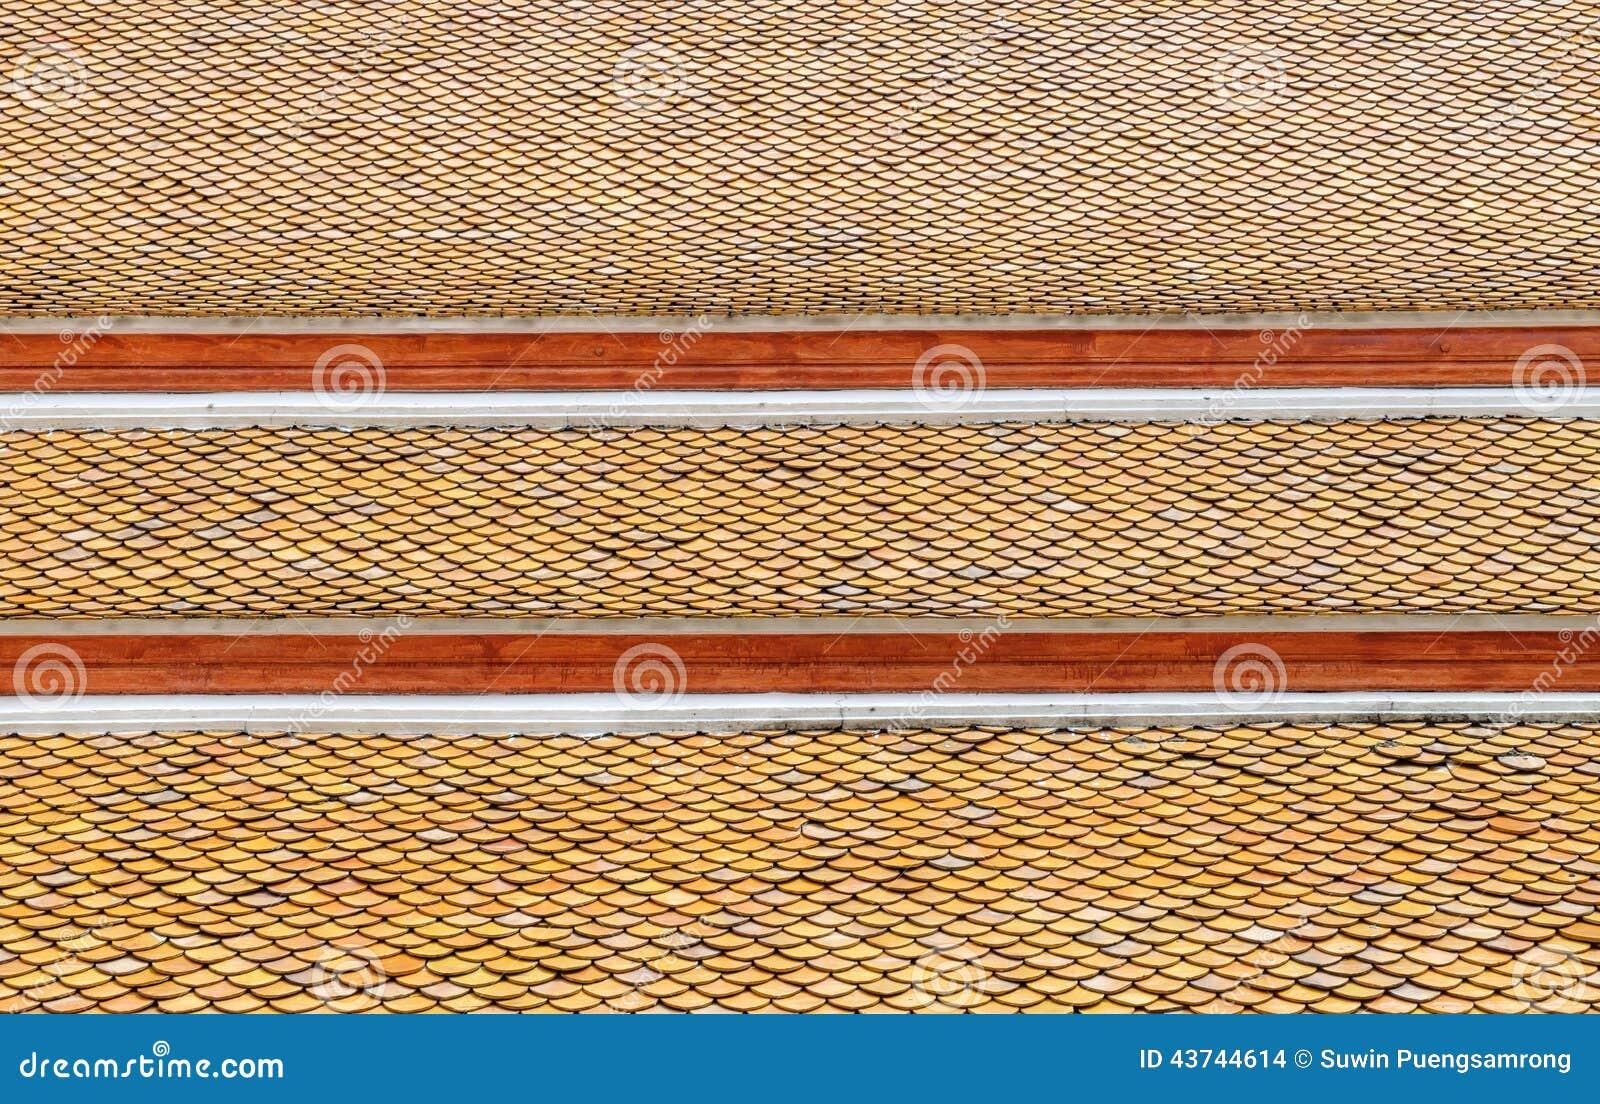 Daktegels van Thaise tempel